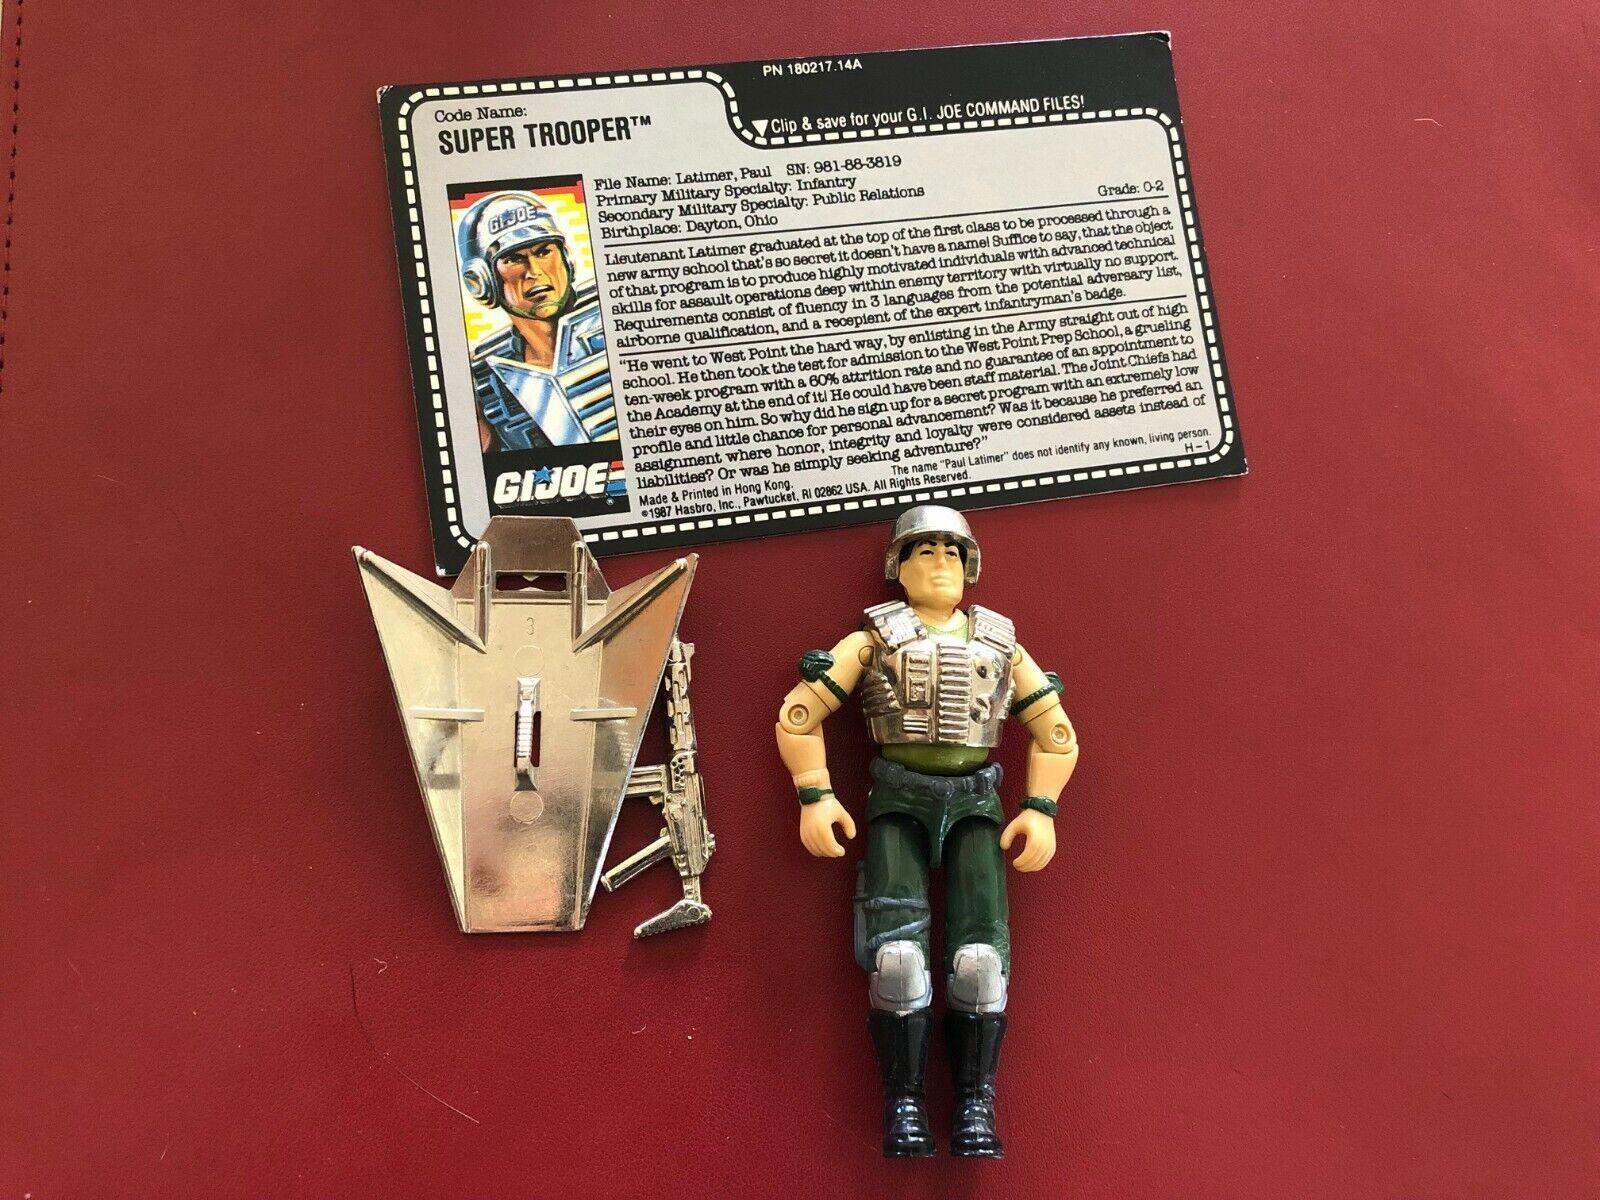 Vintage GI Joe 1988 Chrome Super Trooper V1 100% completare w File autod